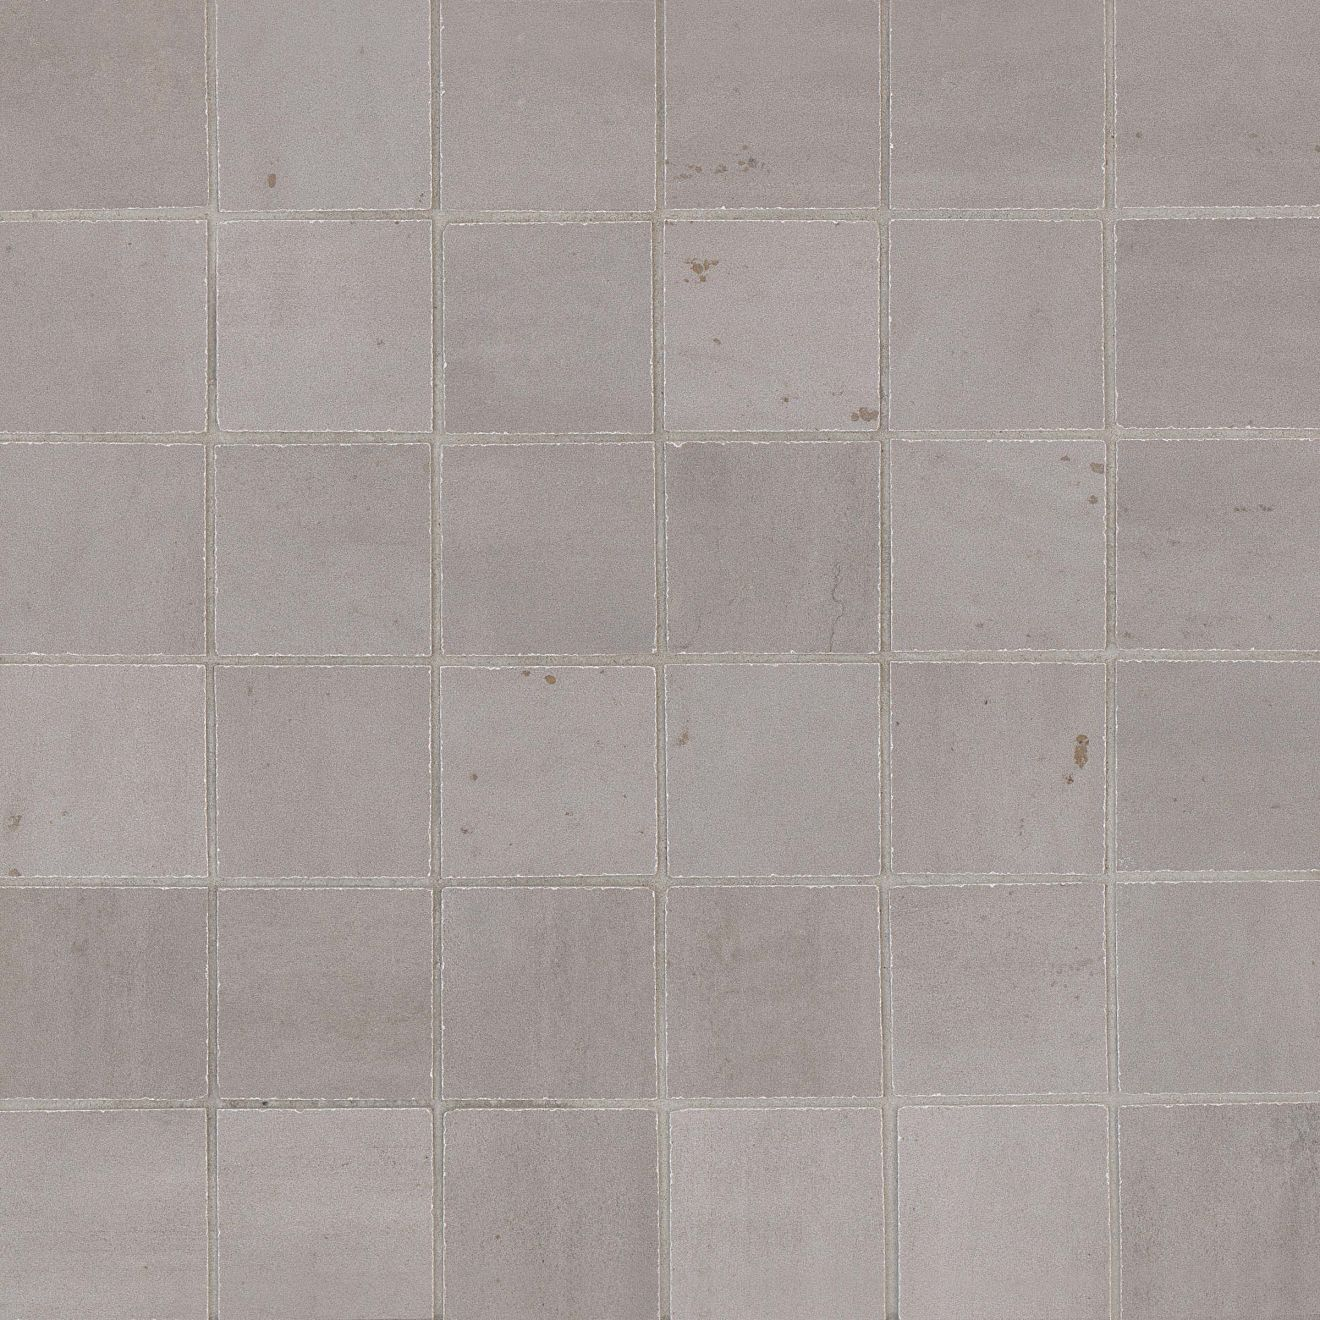 "Rebel 2"" x 2"" Floor & Wall Mosaic in Silver"